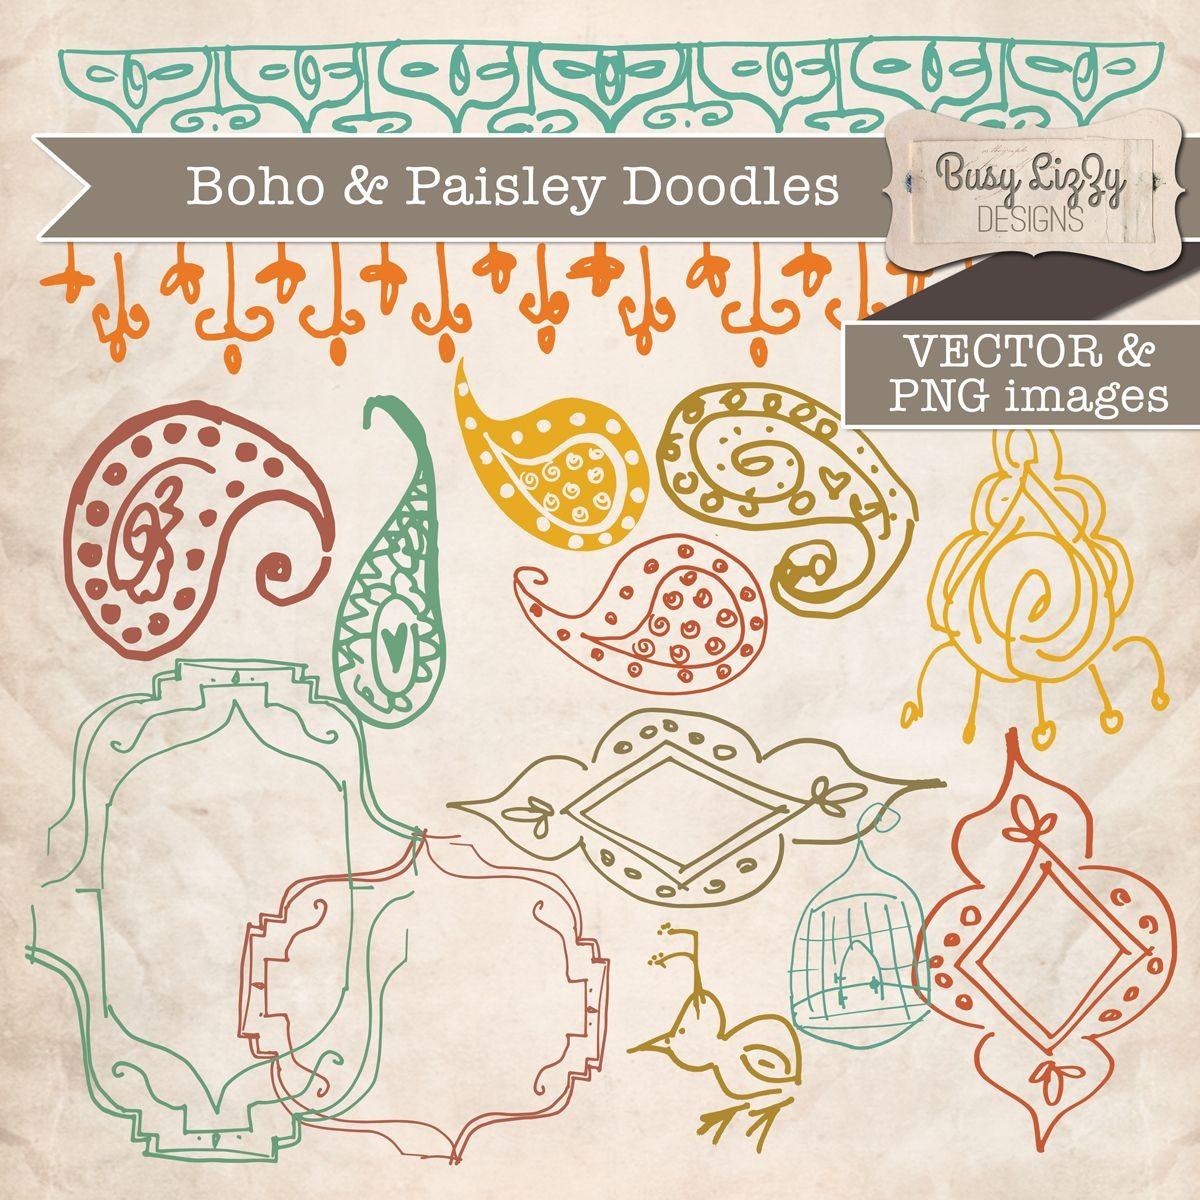 Boho & Paisley Doodles Clipart.